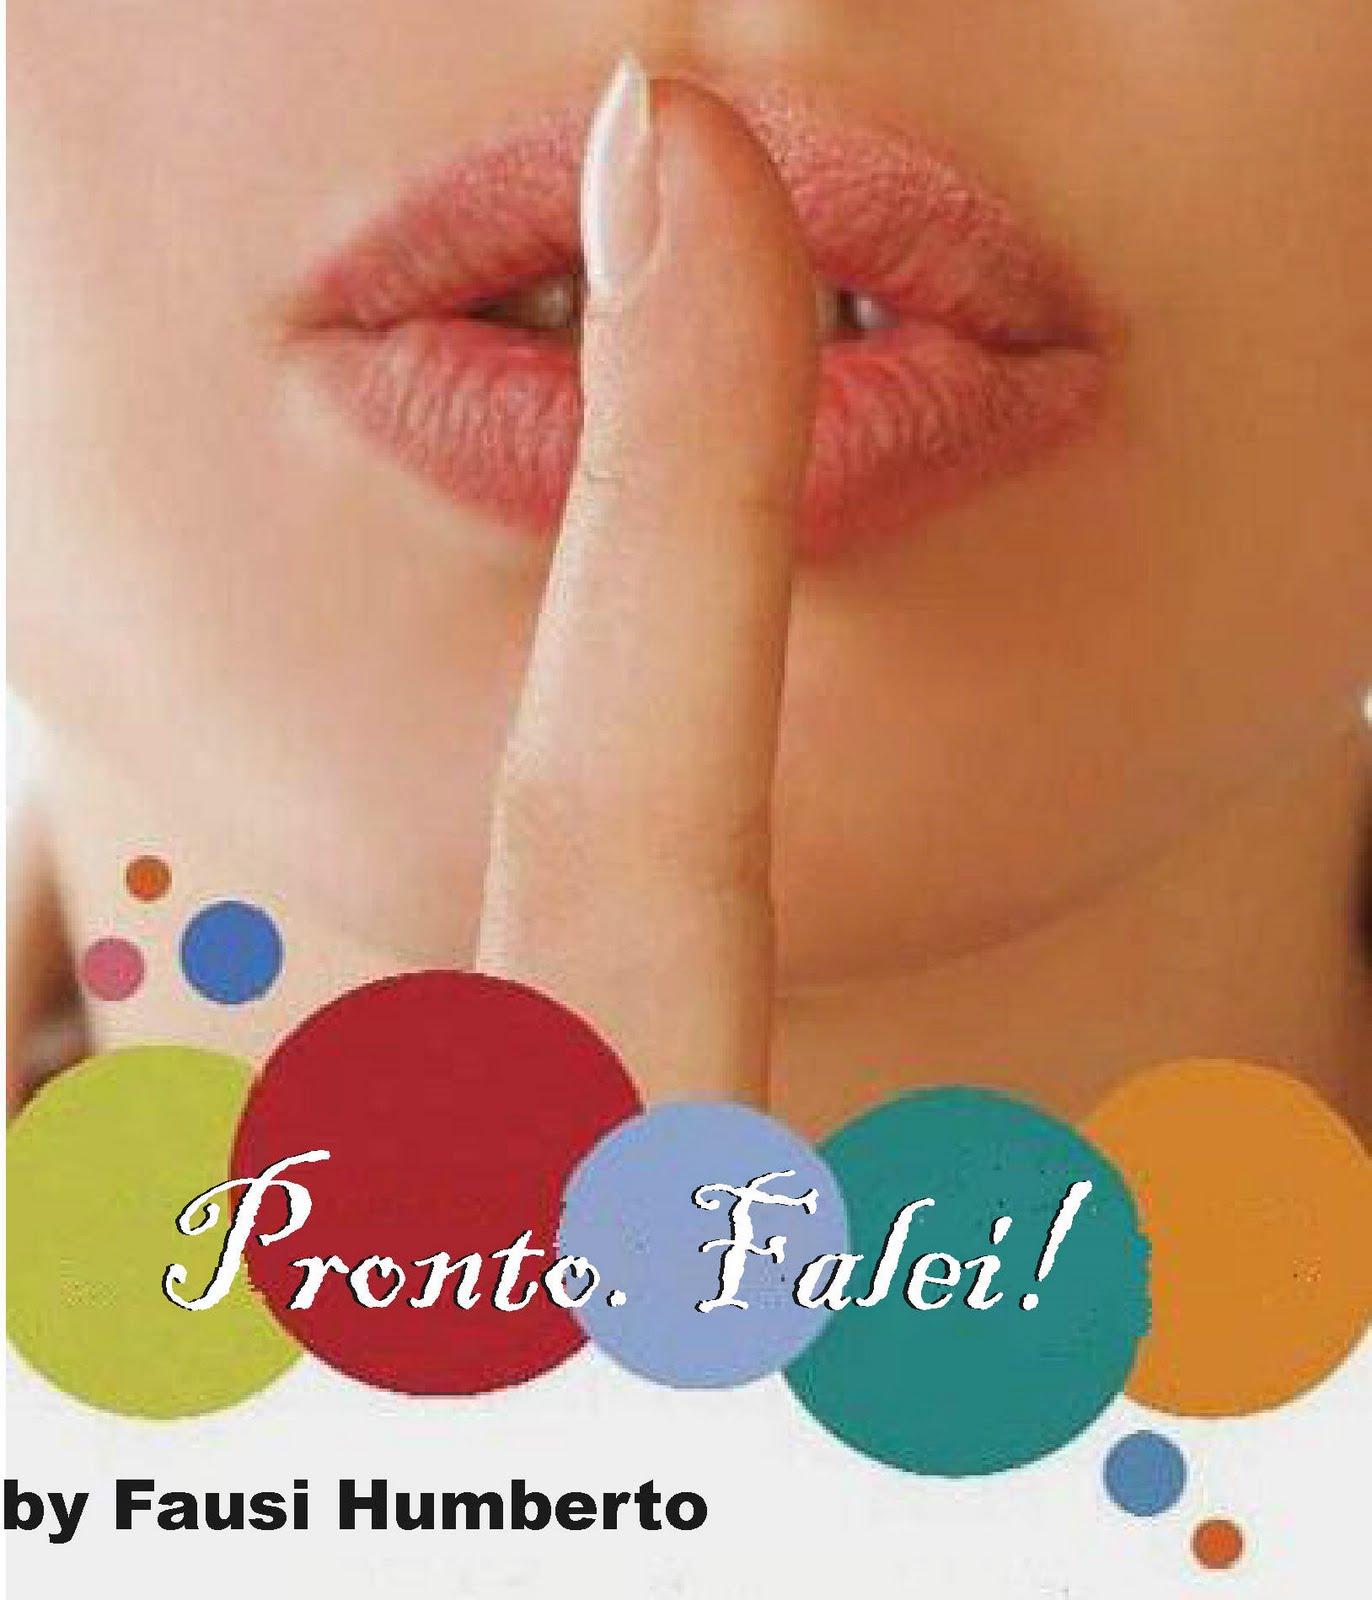 http://1.bp.blogspot.com/_ITB1aPkE0F0/TN-dgdbCuaI/AAAAAAAABJw/OklEvQewmQA/s1600/pronto.falei.jpg